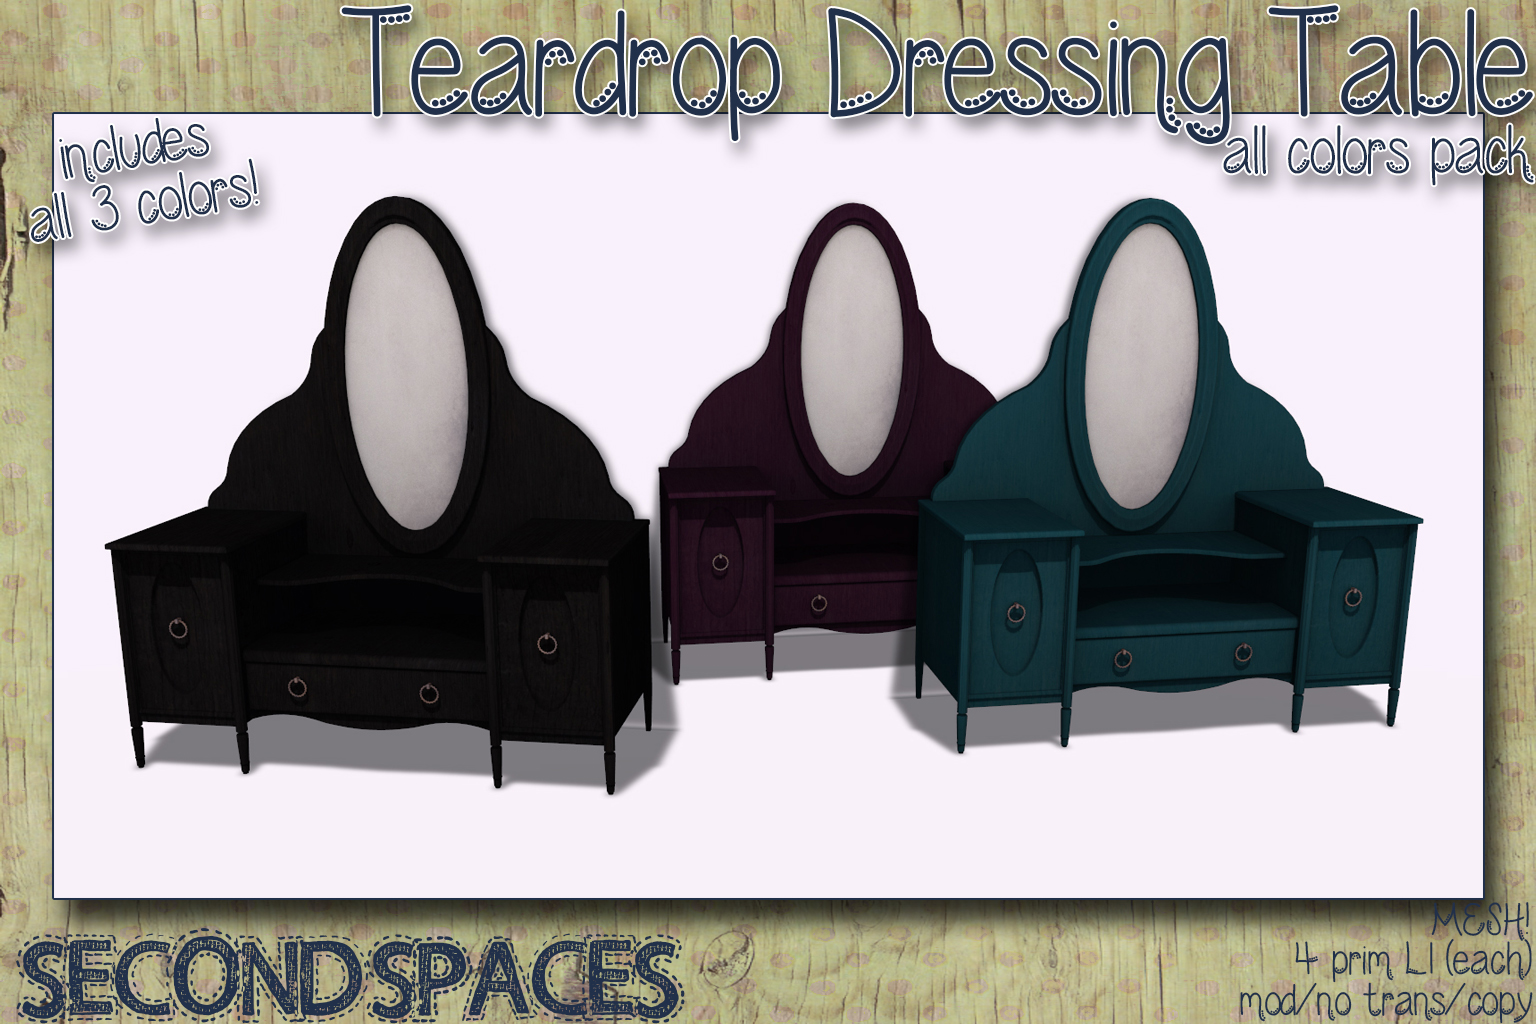 teardrop dressing table_color pack_vendor.jpg